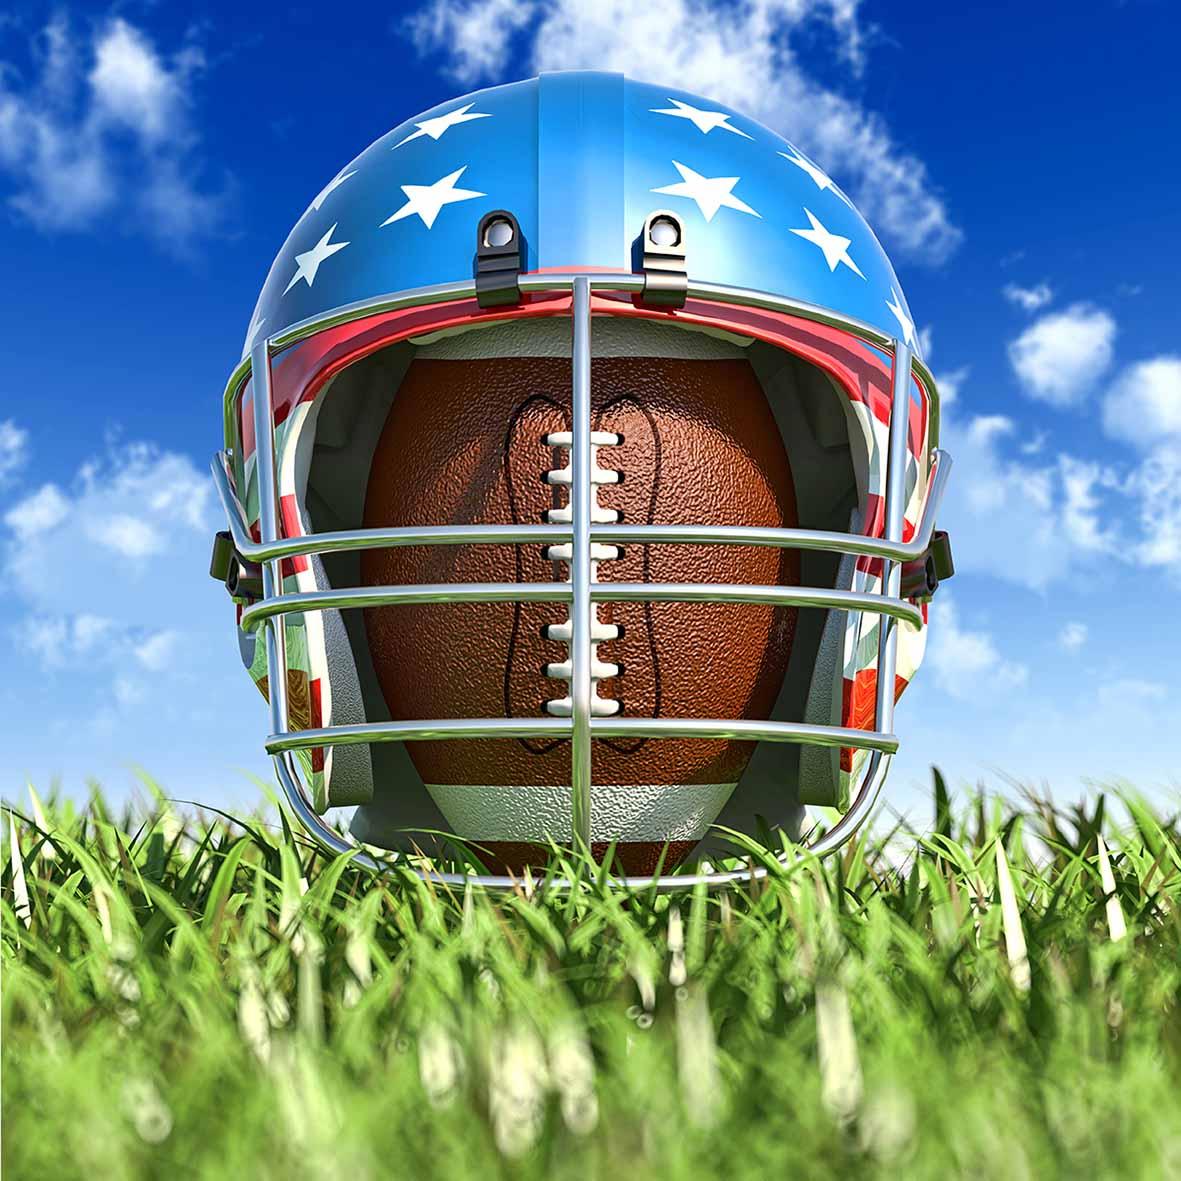 Allenjoy photo background American football helmet grass sky bokeh background for photo photo studio backdrop